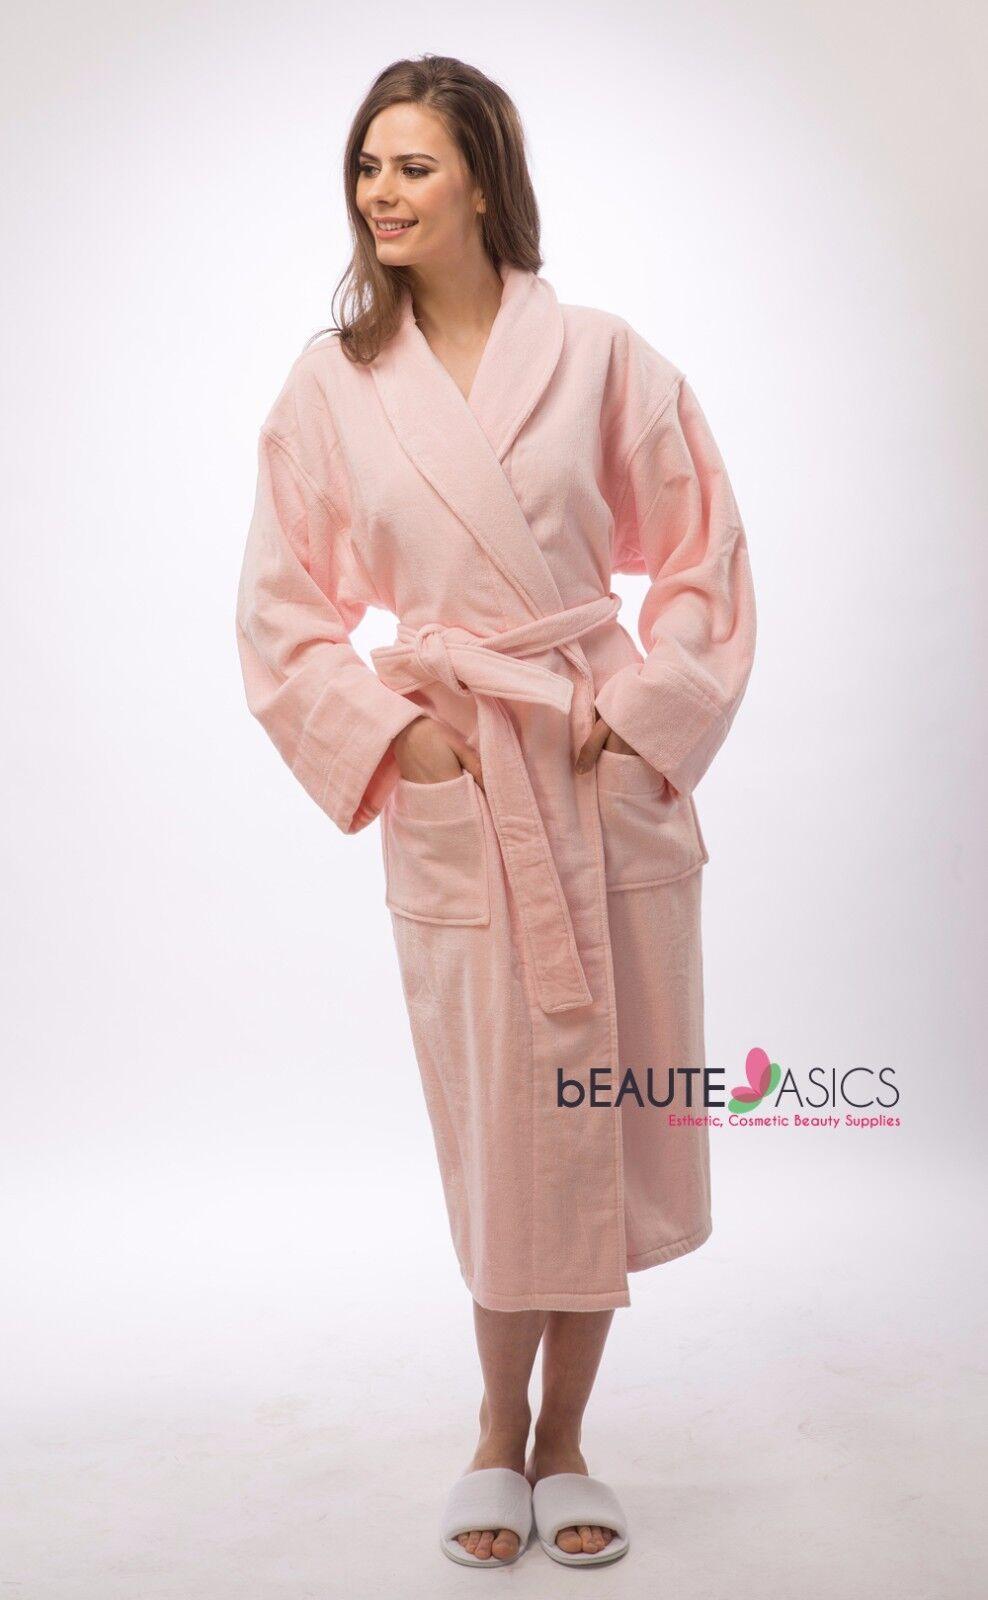 #AR111P x1 Luxury Spa Robe 100/% Cotton Bathrobe Peach Pink